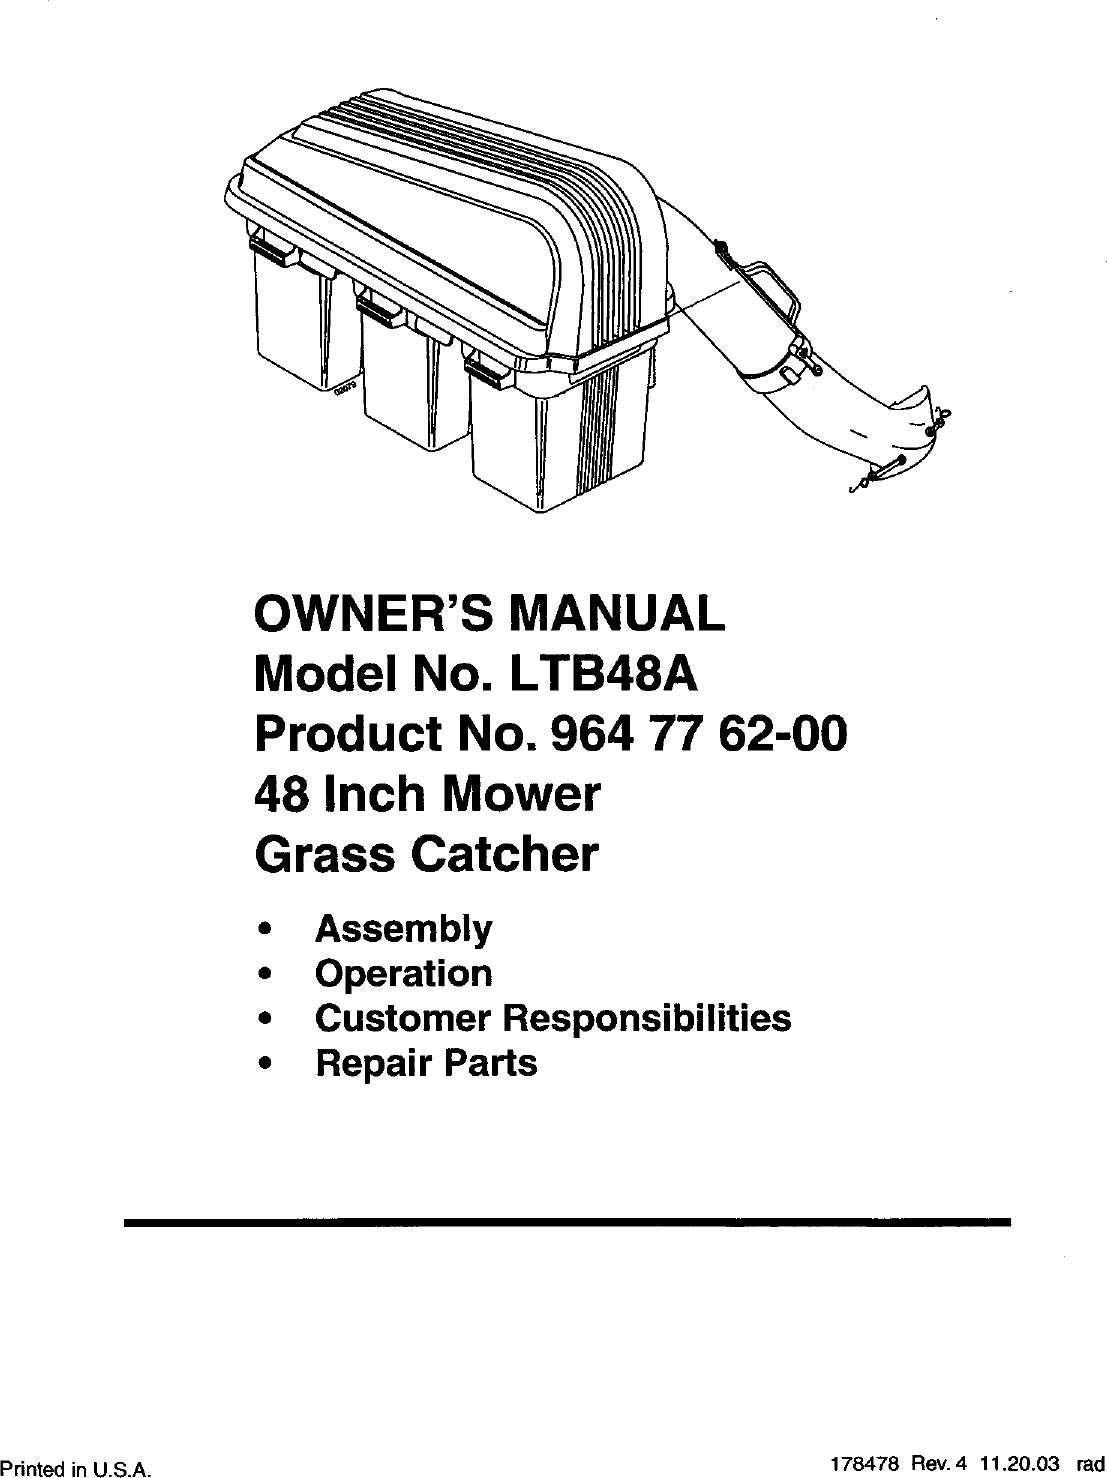 Bestseller: Electrolux Lawn Mower User Manual